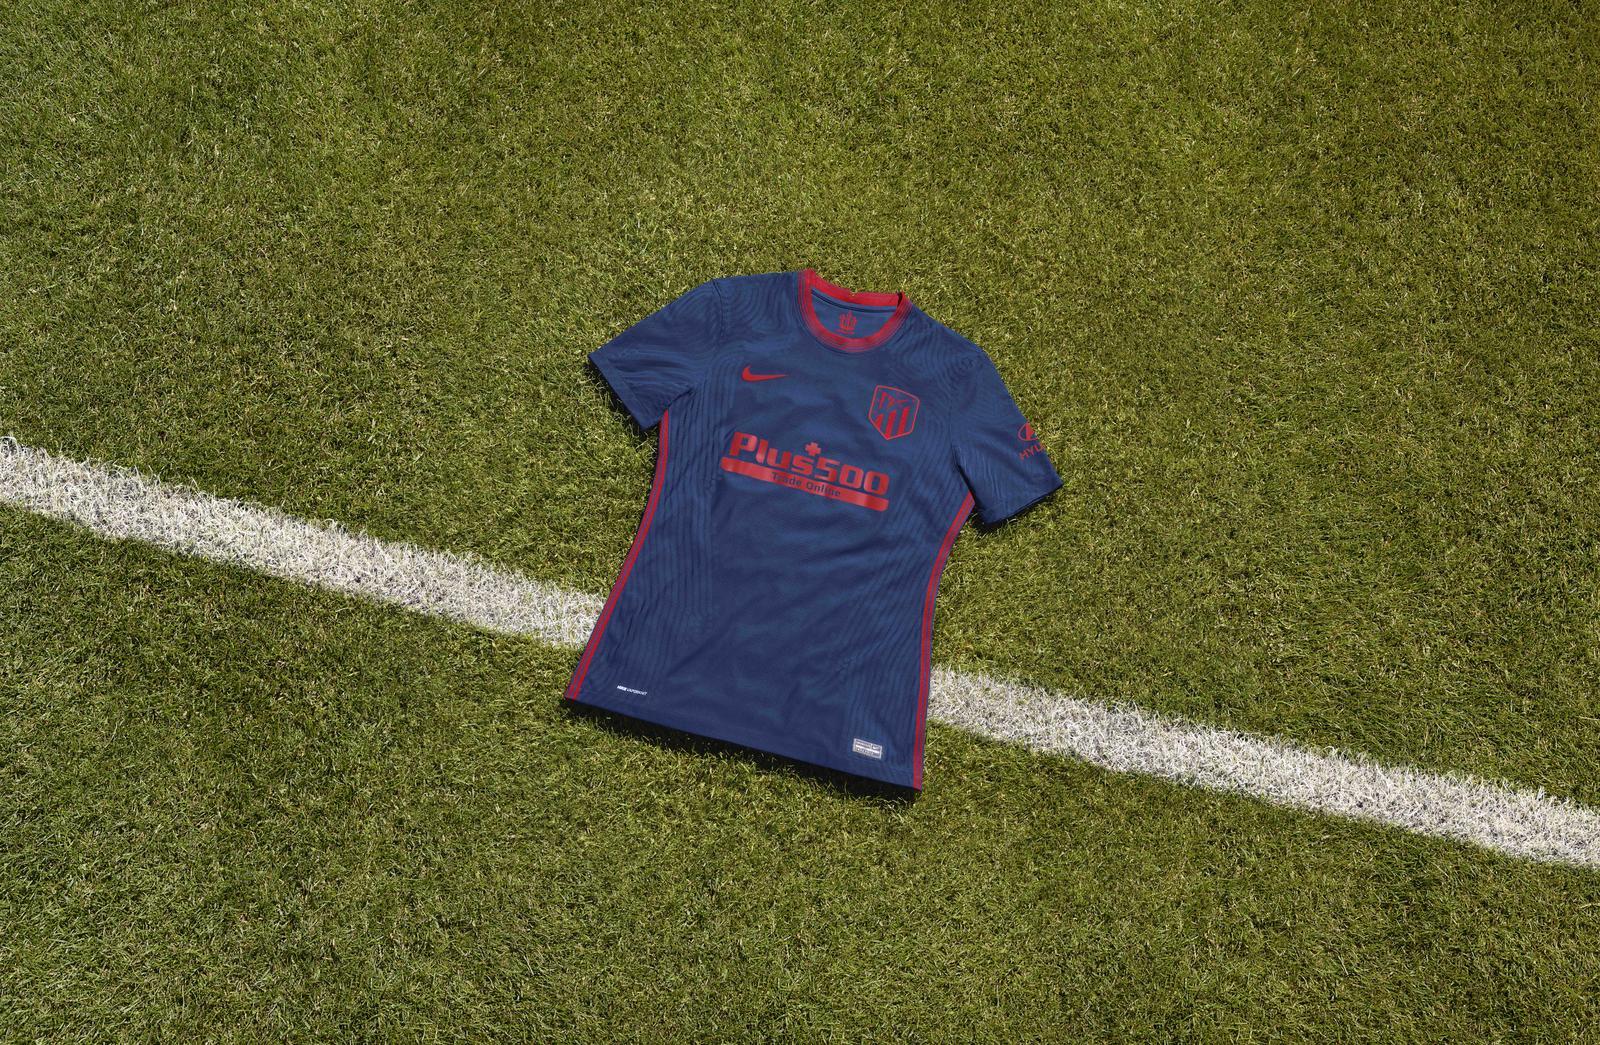 Atlético de Madrid 2020-21 away kit